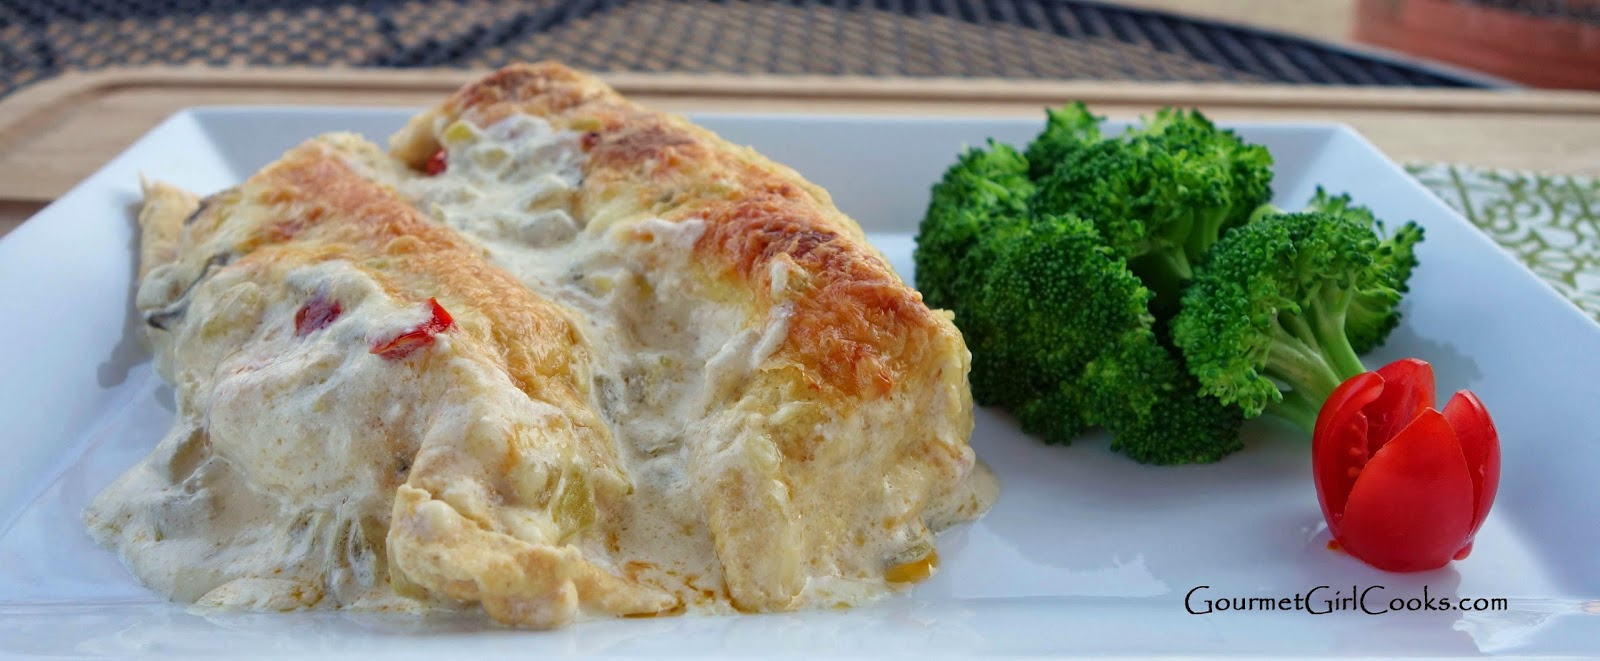 Low Carb Chicken Enchilada Bake Recipes — Dishmaps